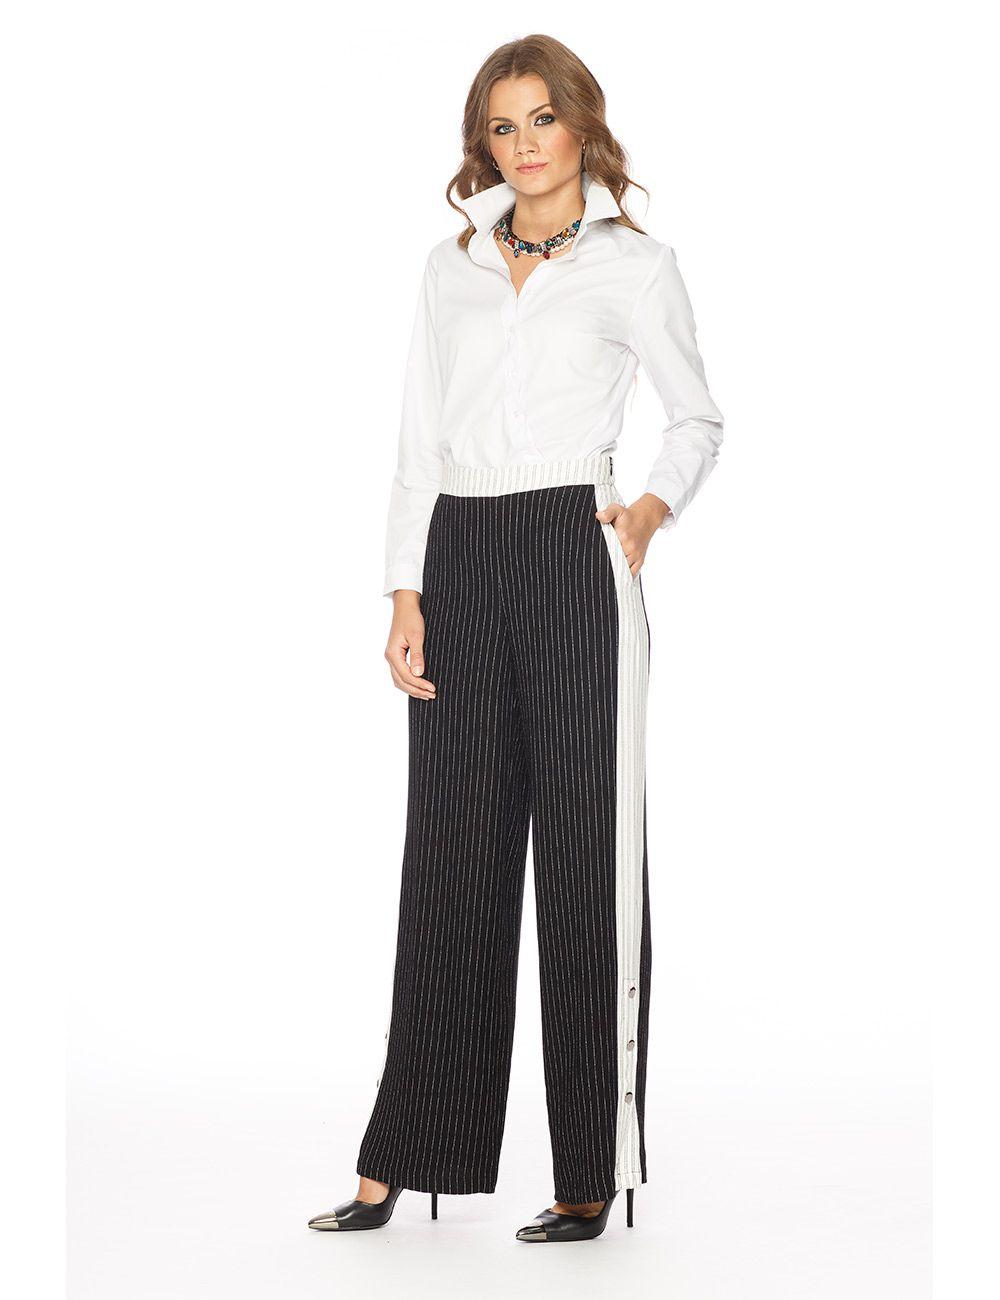 Calça Crepe de Viscose Risca de Giz Pantalona Cós Alto